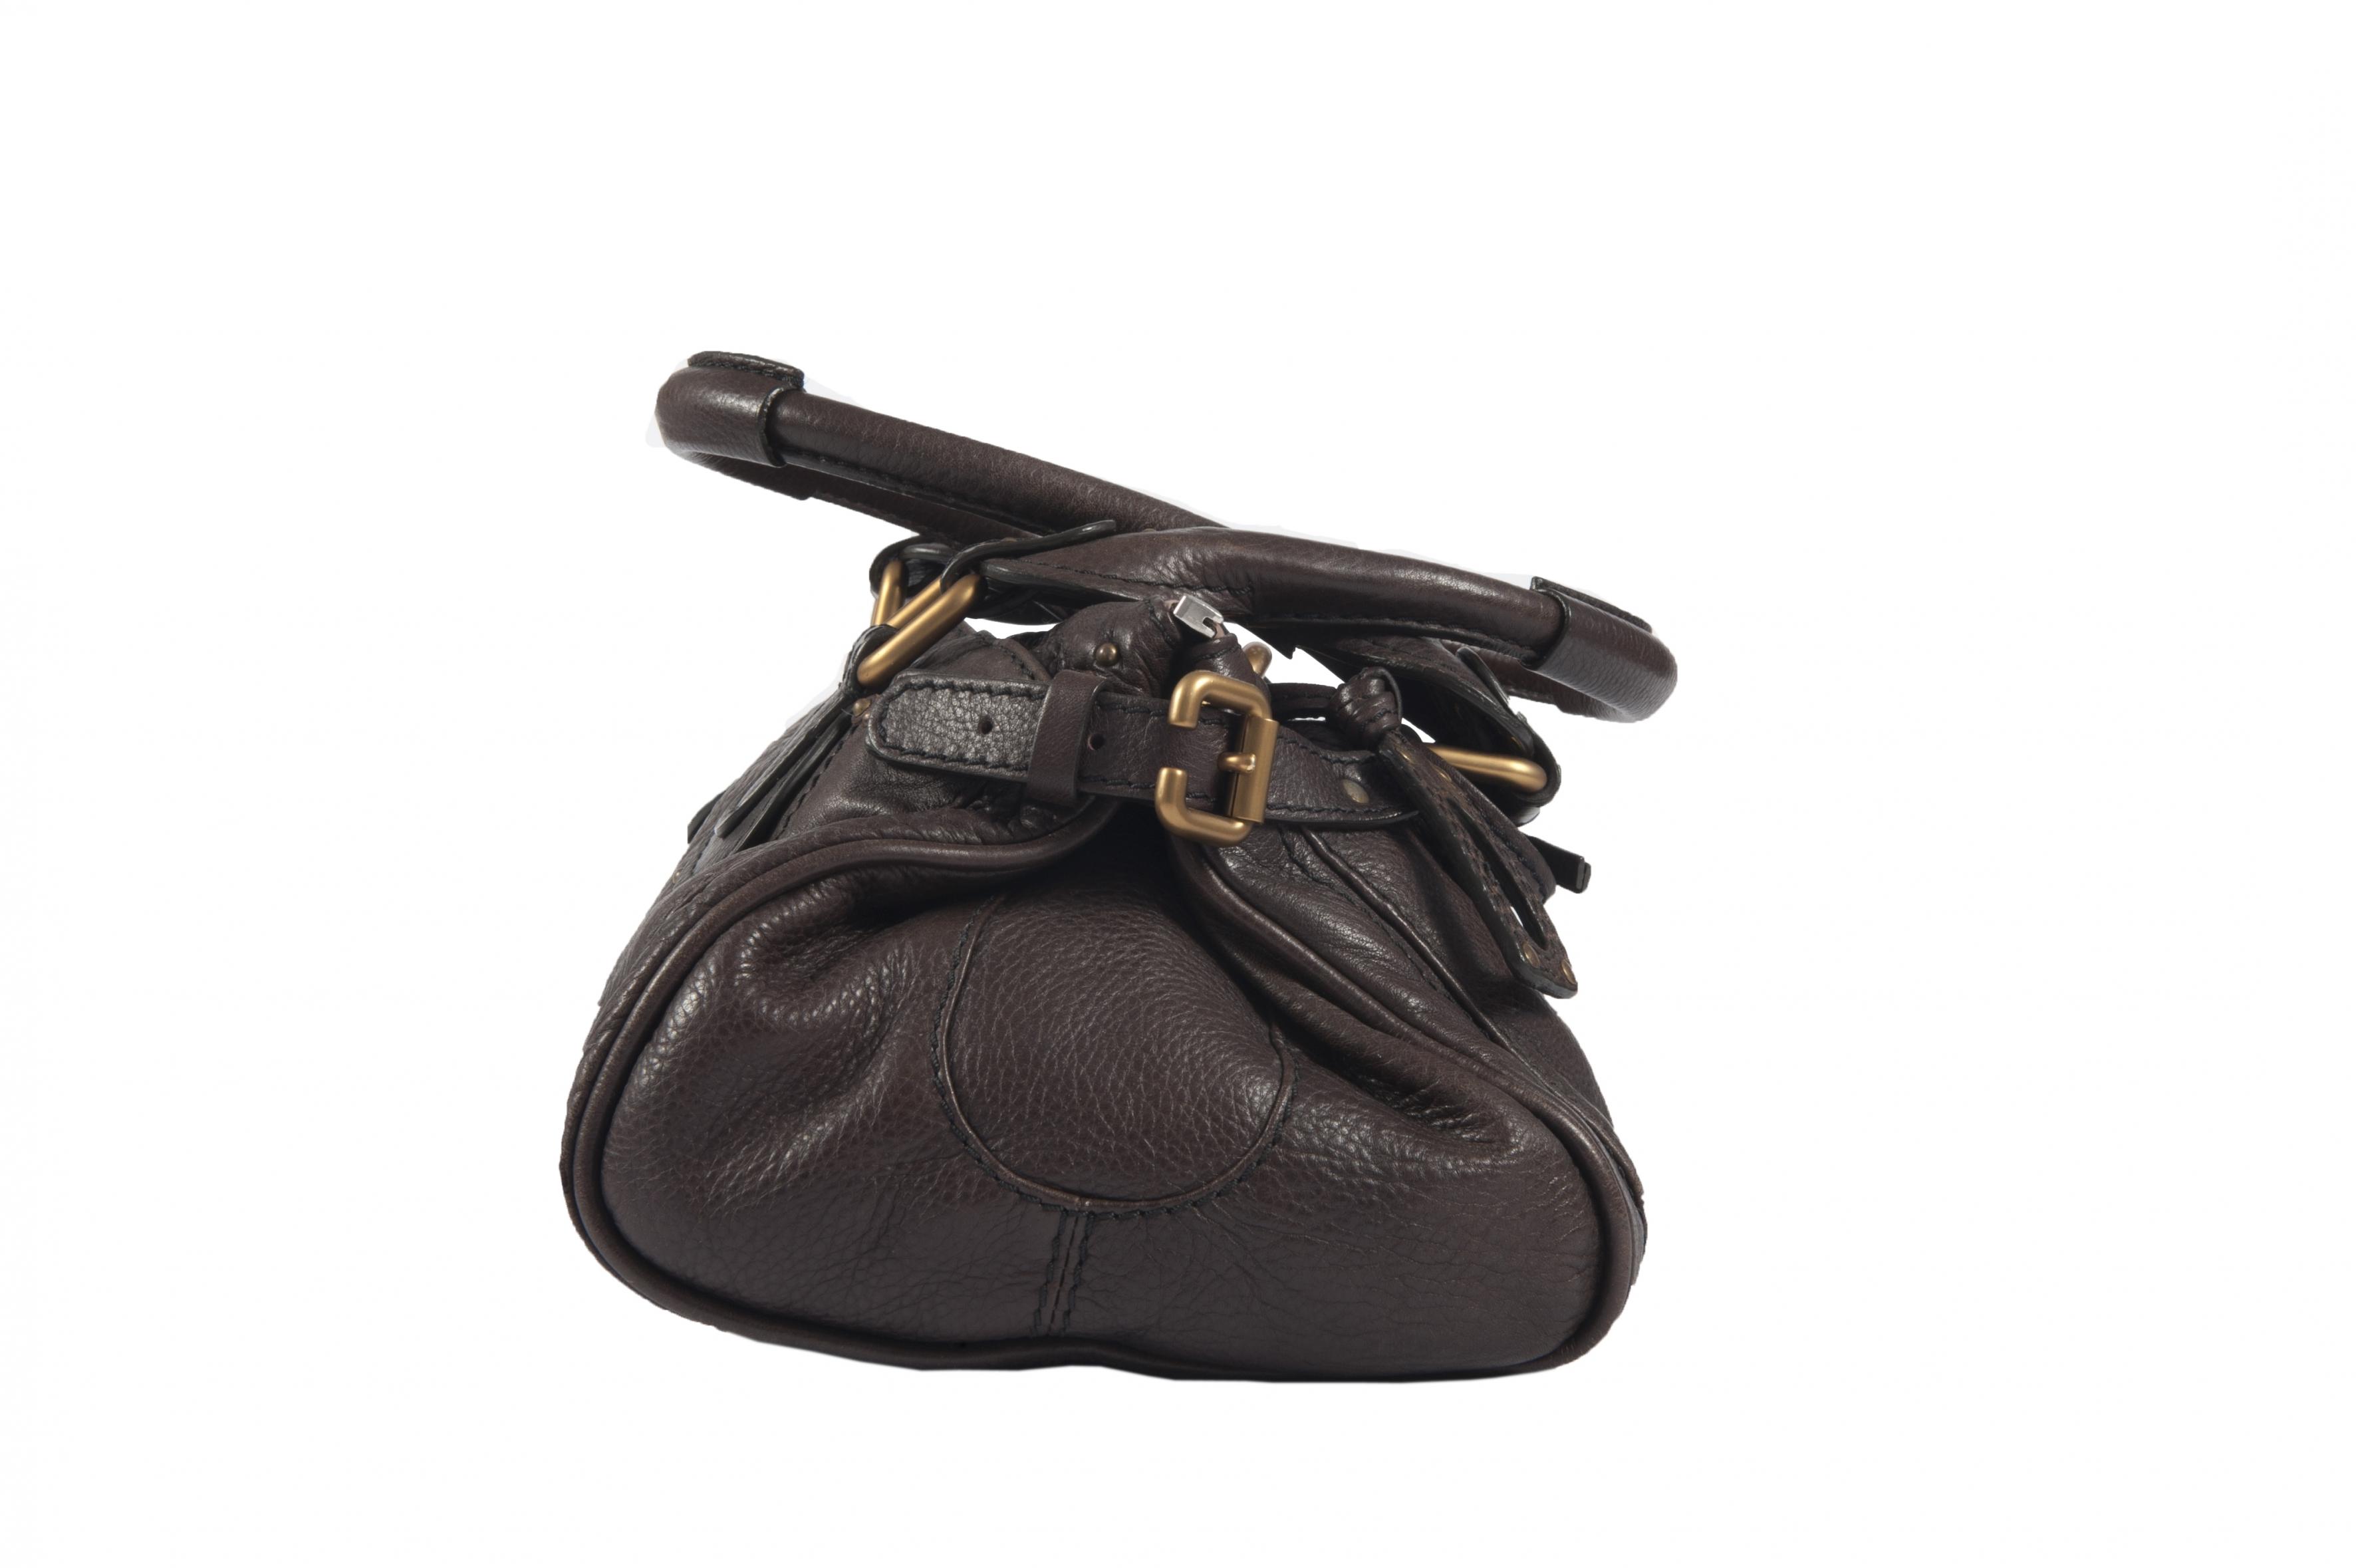 Chlo¨¦ \u0026#39;\u0026#39; Paddington\u0026#39;\u0026#39; handbag - Vintage Shop in Mykonos